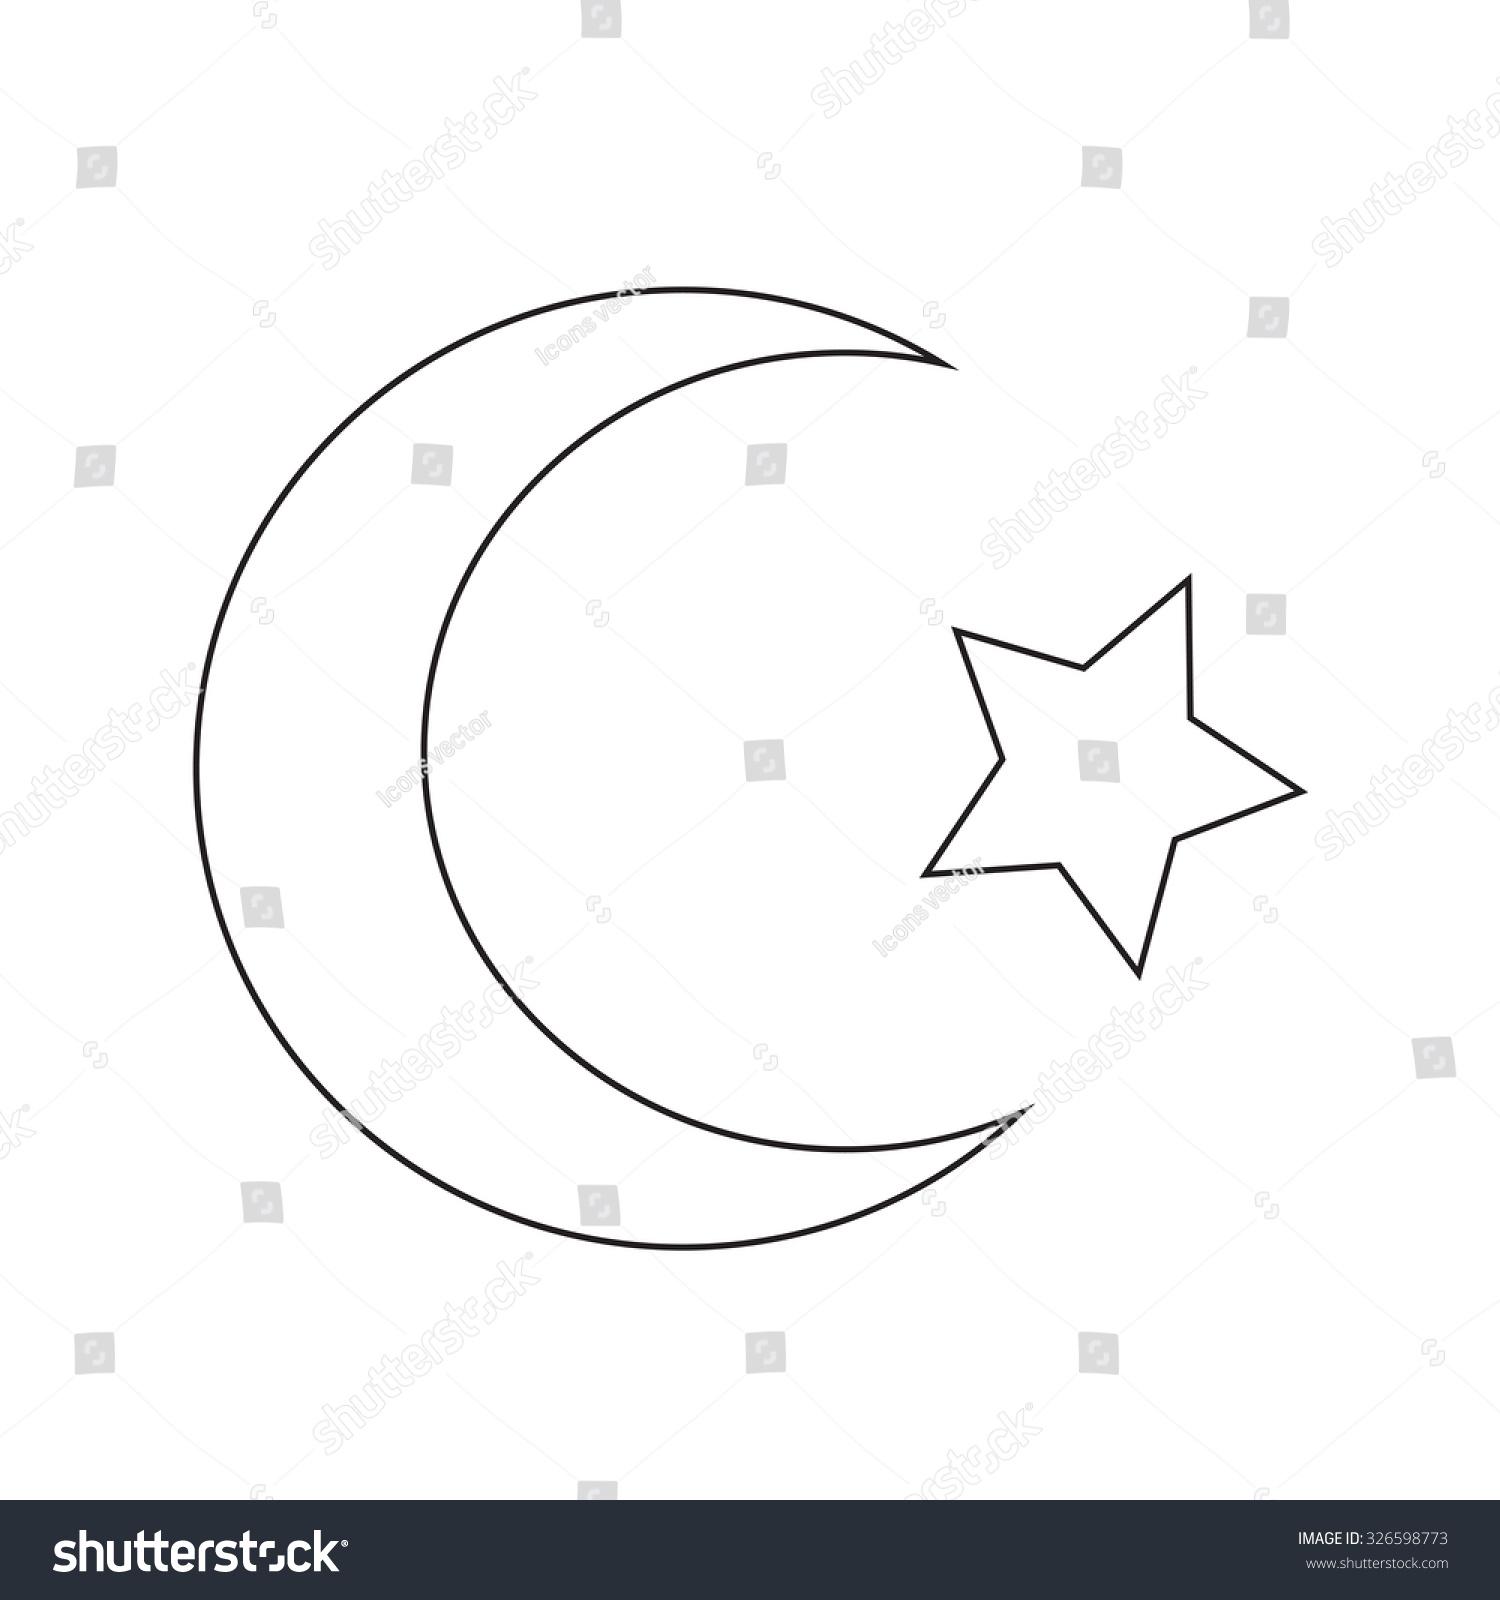 Symbol islam star crescent icon stock vector 326598773 shutterstock symbol of islam star crescent icon buycottarizona Gallery